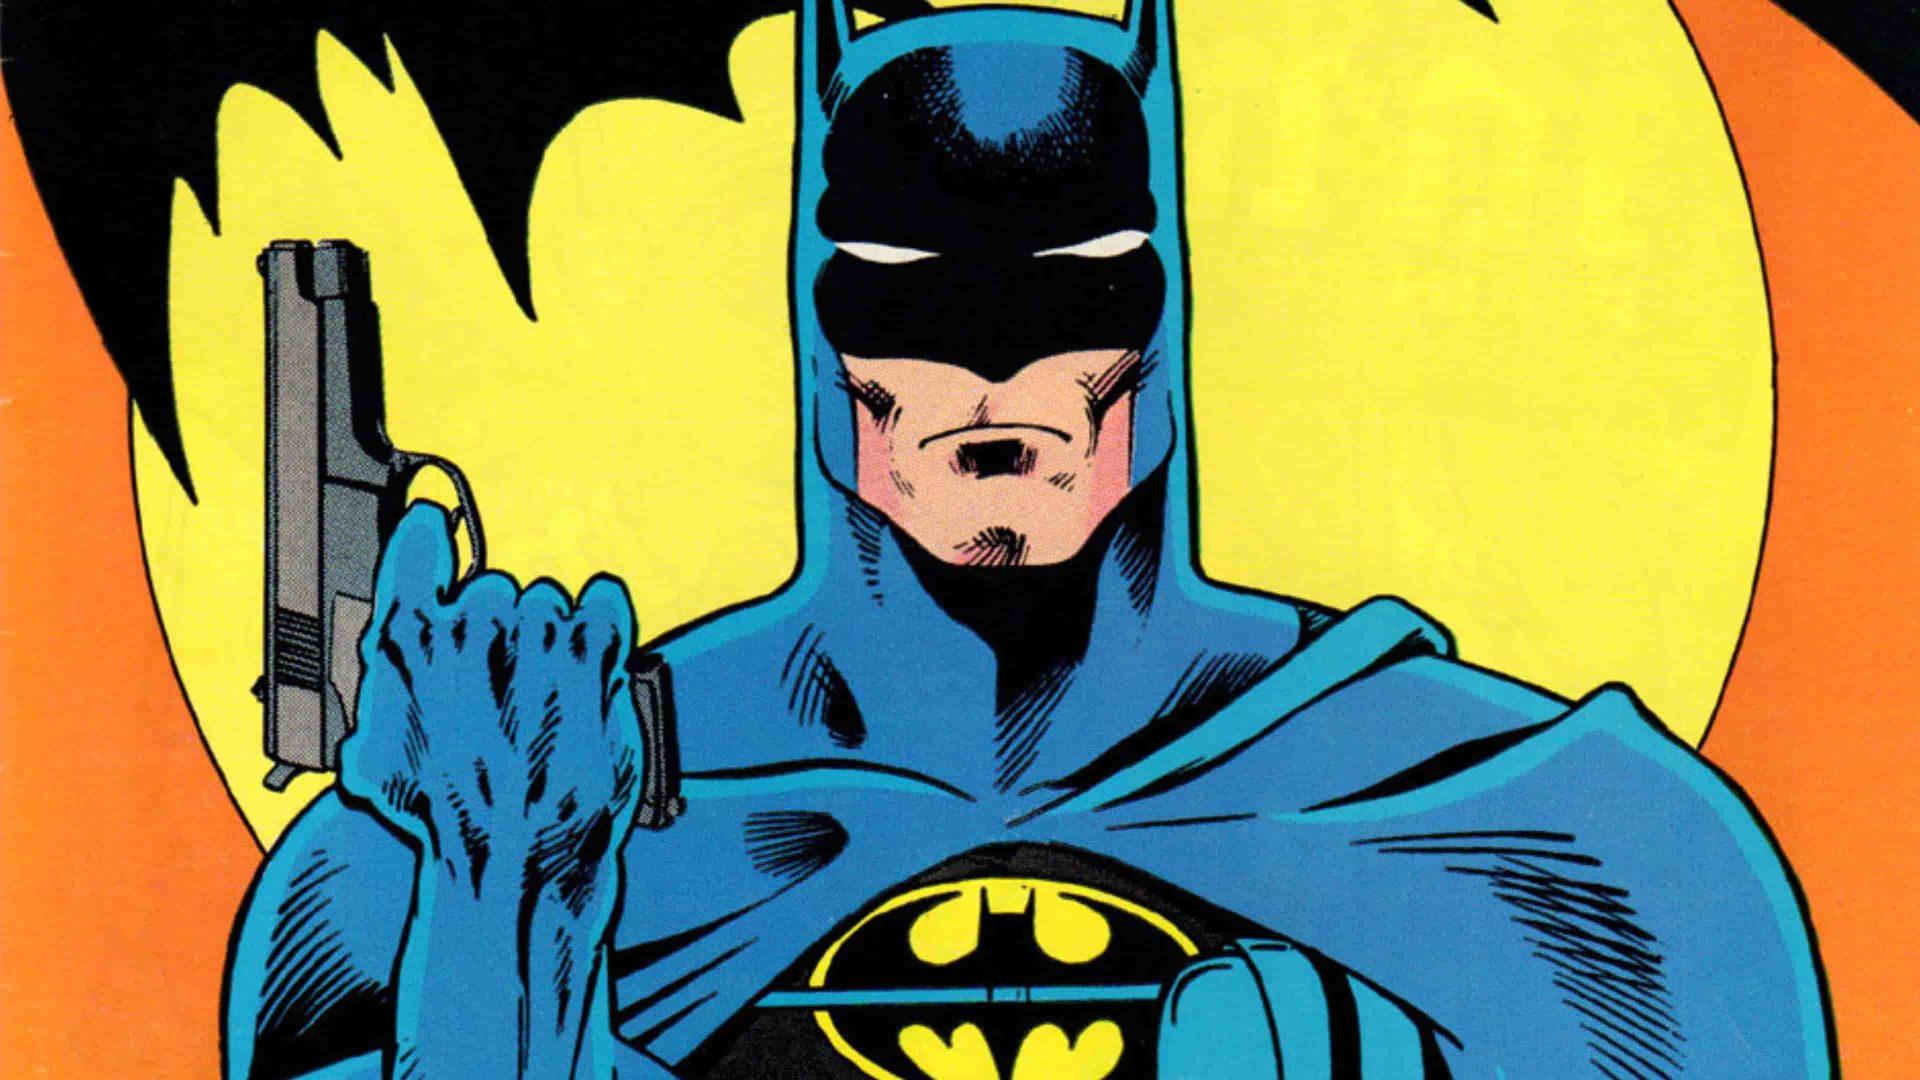 Batman, comic book depiction